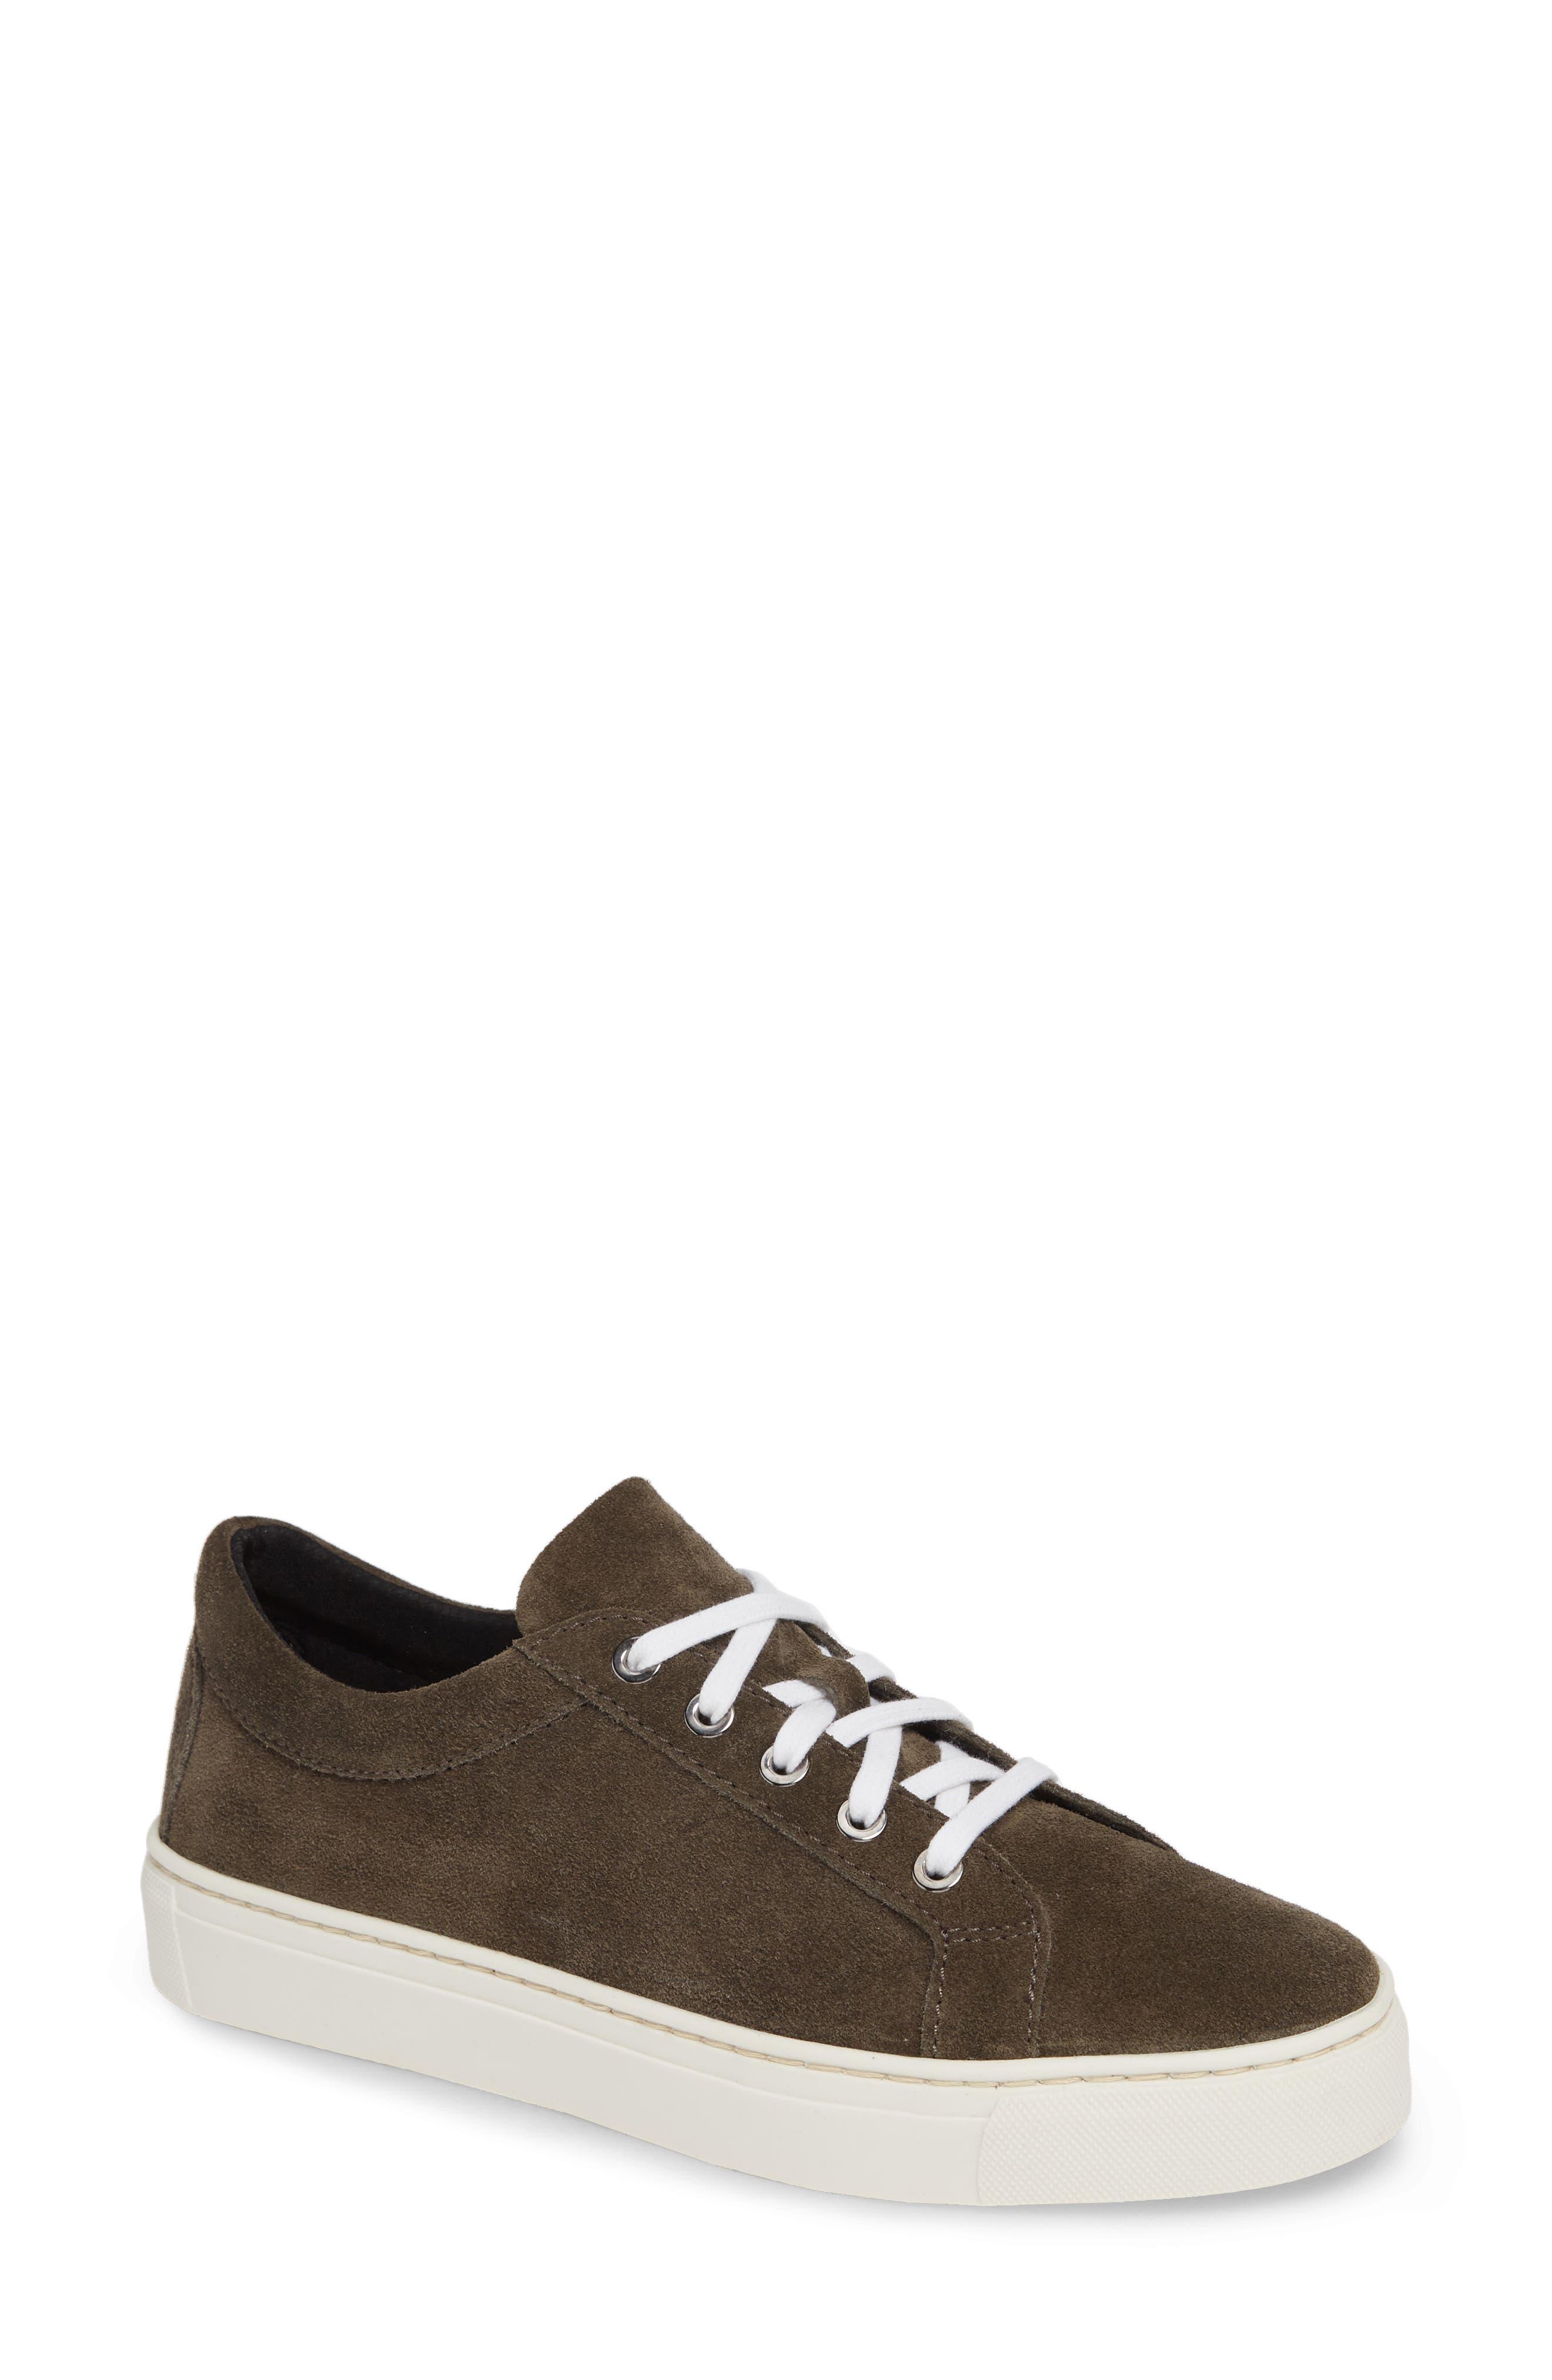 The Flexx Sneak Away Sneaker- Brown